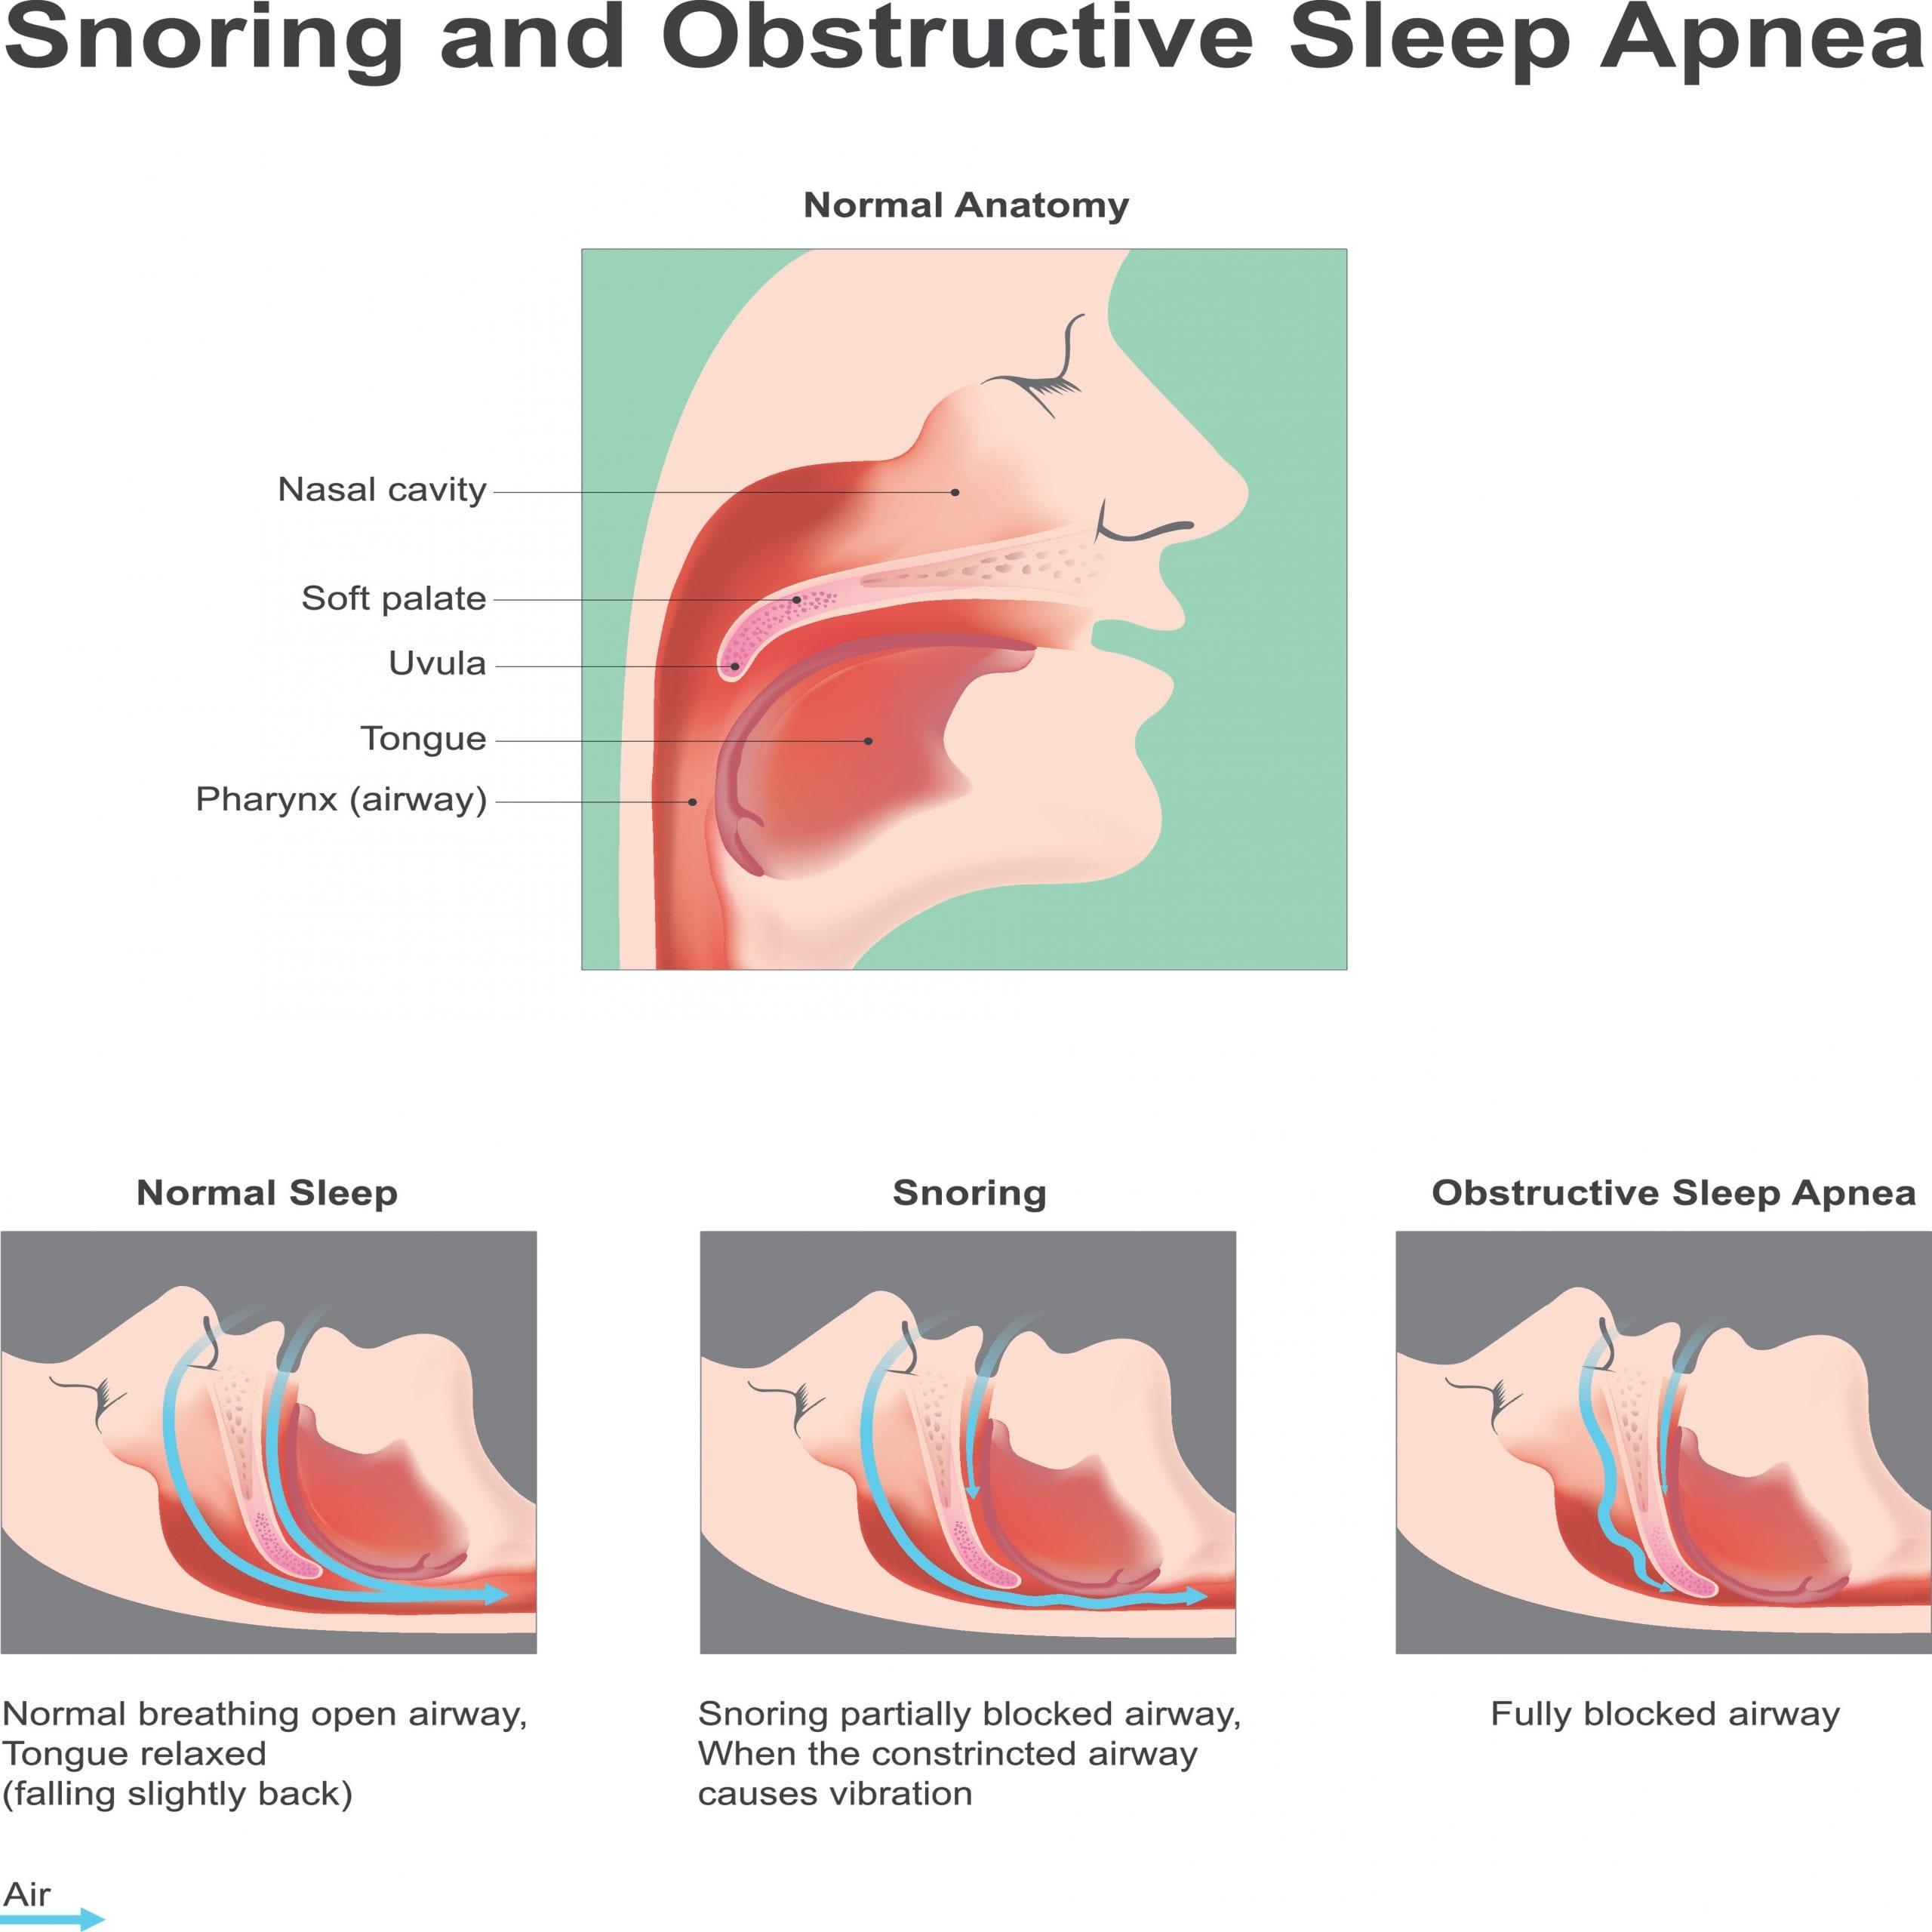 Boulder dental designs sleep apnea in boulder, co Dr. John Montoya dentist in Boulder, co sleep apnea dentist in boulder, co Snoring and obstructive Sleep Apne. Vector graphic.